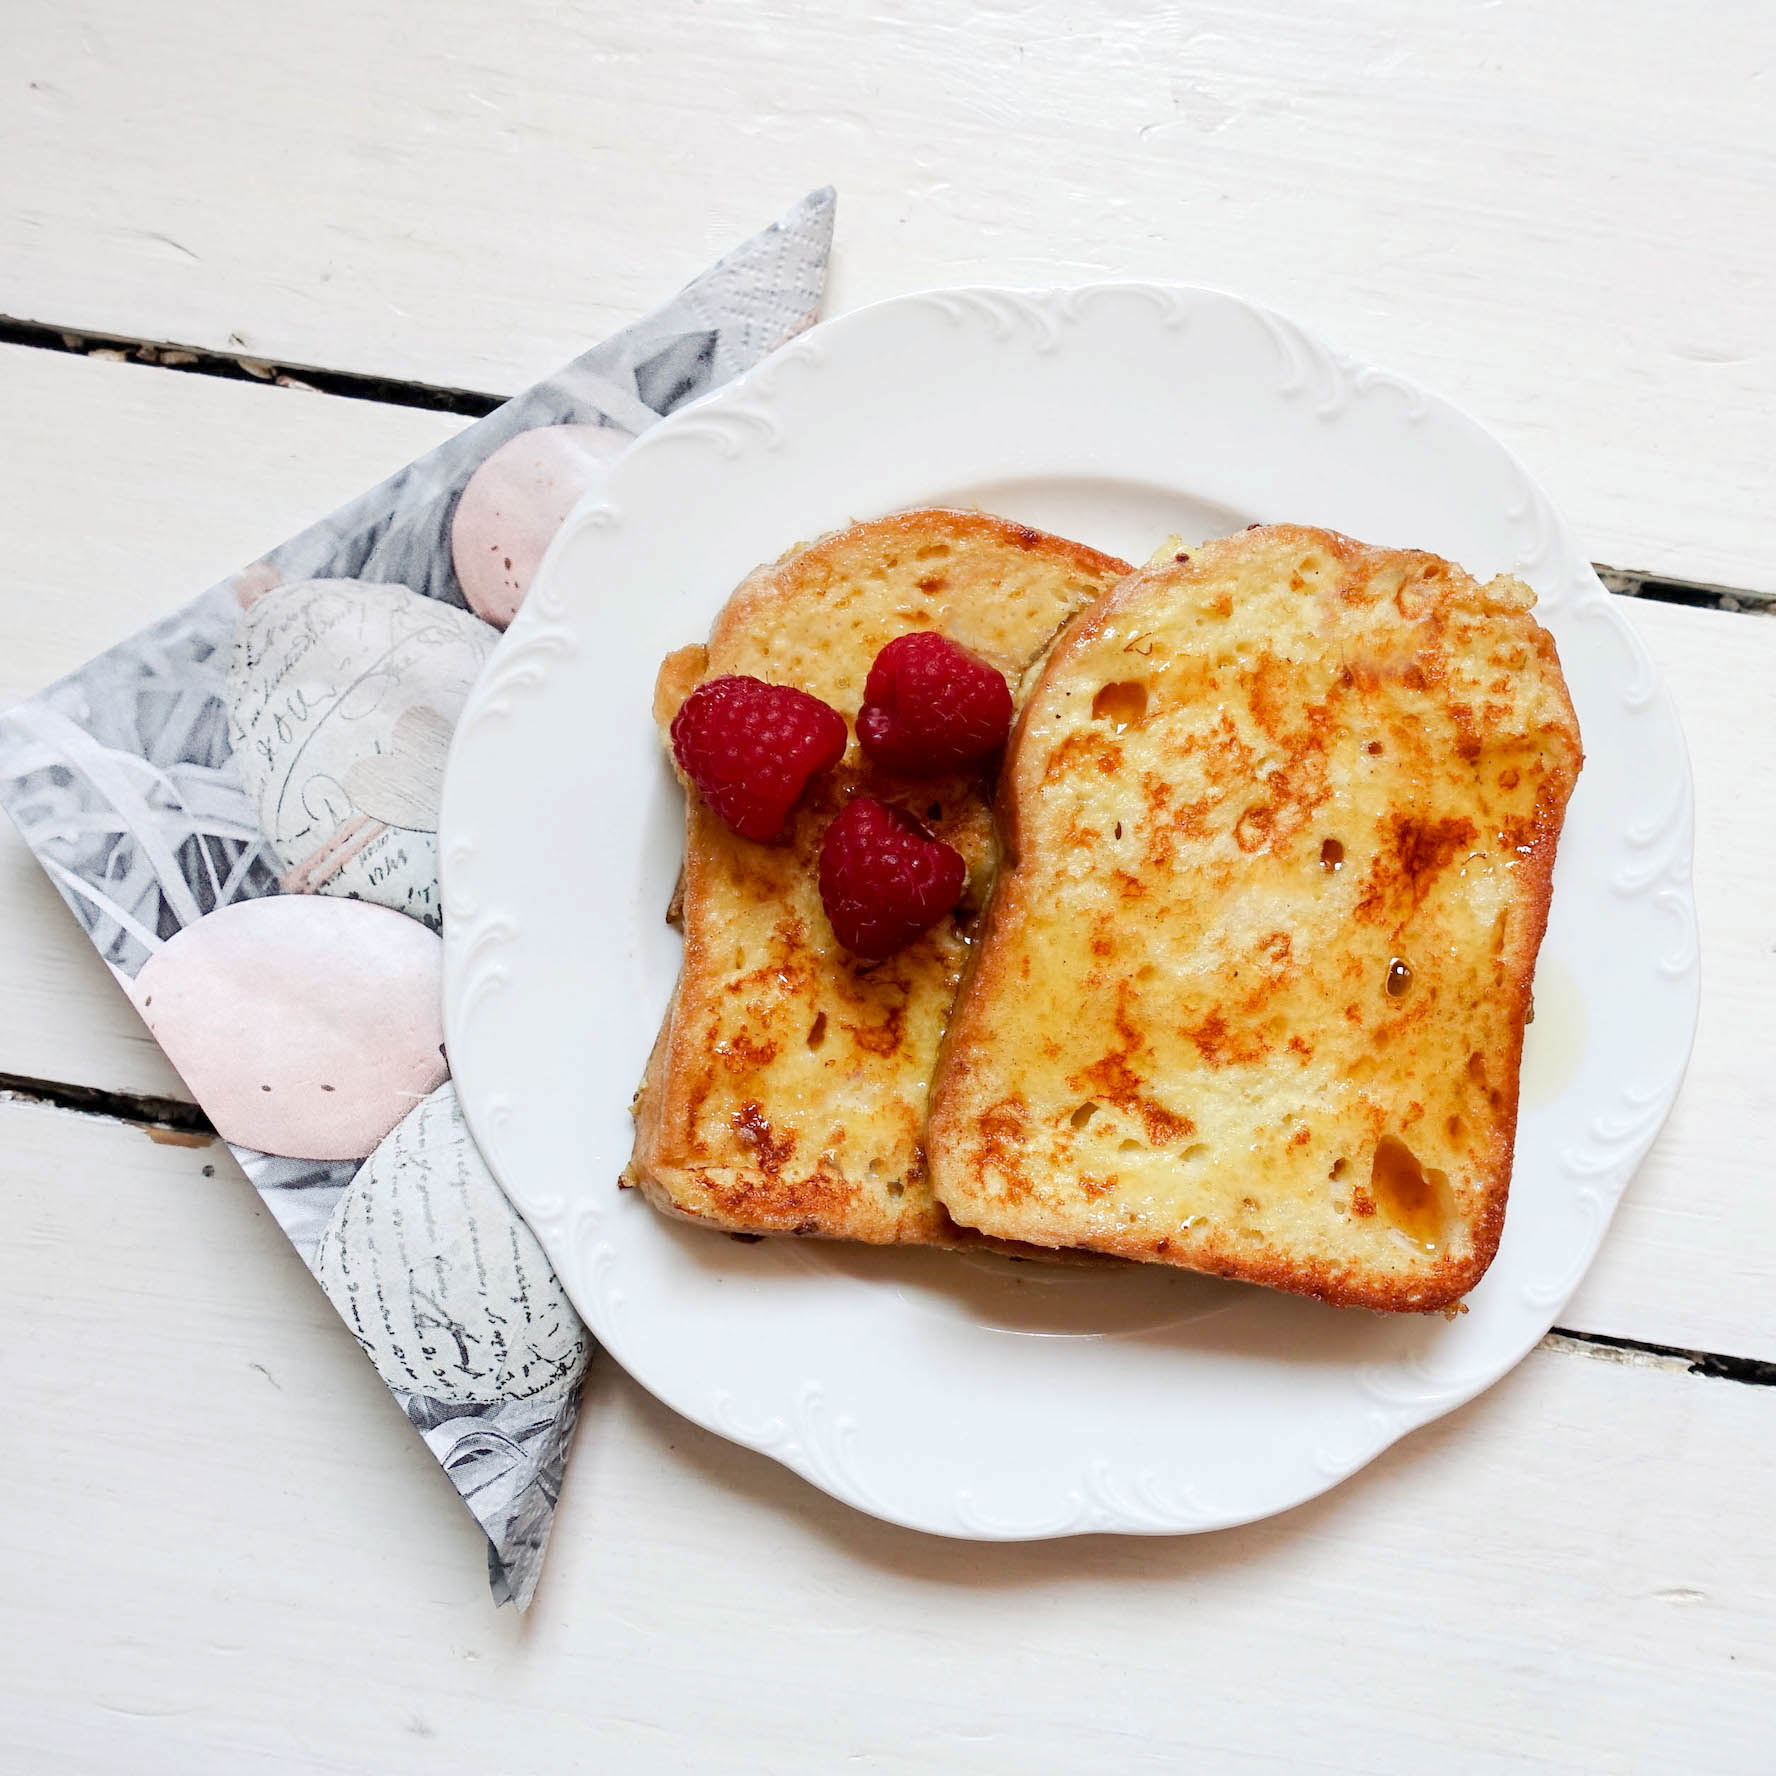 Ostern glutenfrei suelovesnyc_blog_ostern_glutenfrei_susan_fengler_glutenfrei_french_toast_glutenfreier_frenchtoast